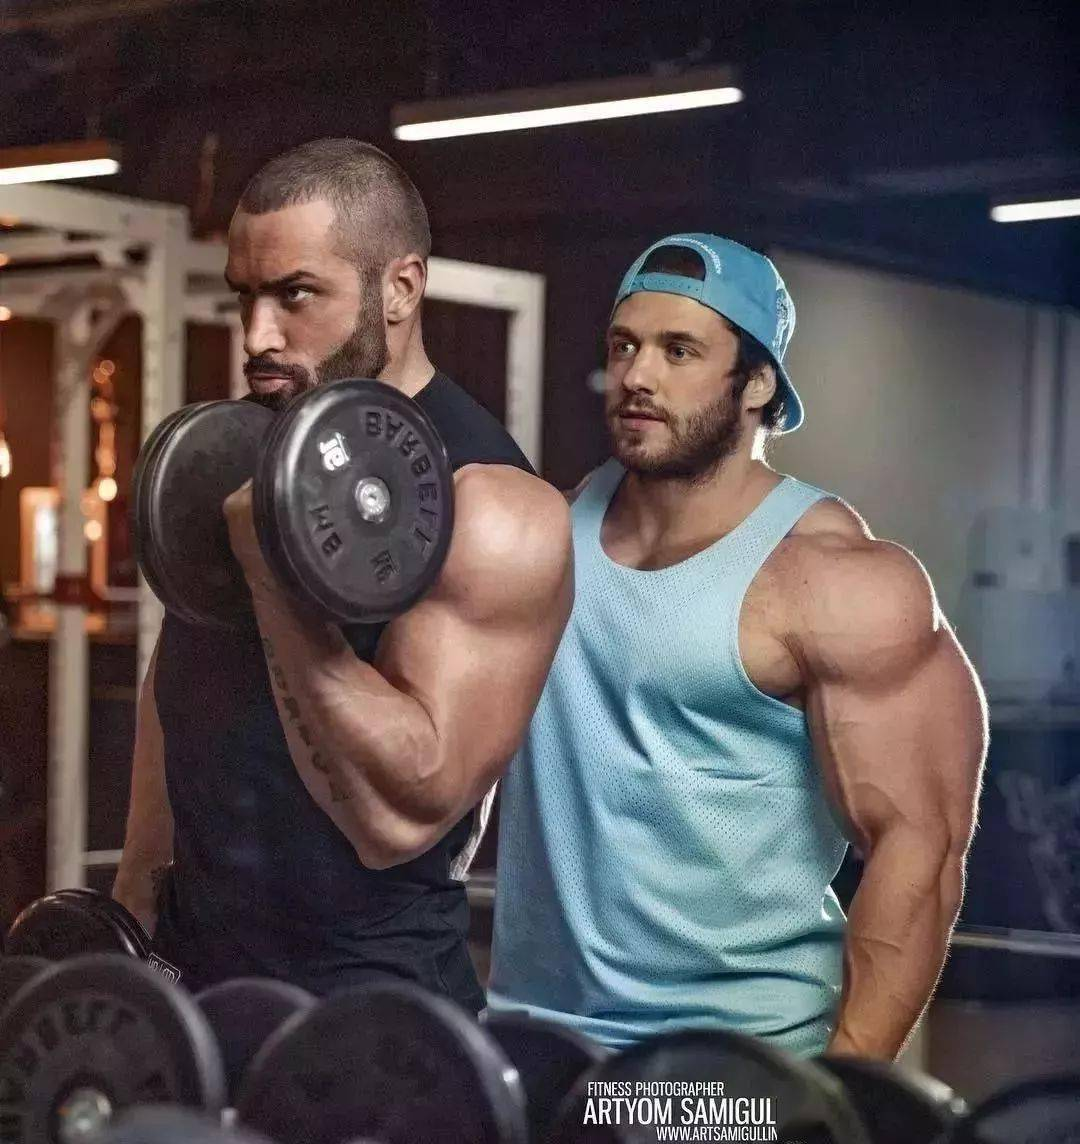 55cm臂围的肌肉硬汉,看了他的奶爸日常,我都想生娃了 初级健身 第7张